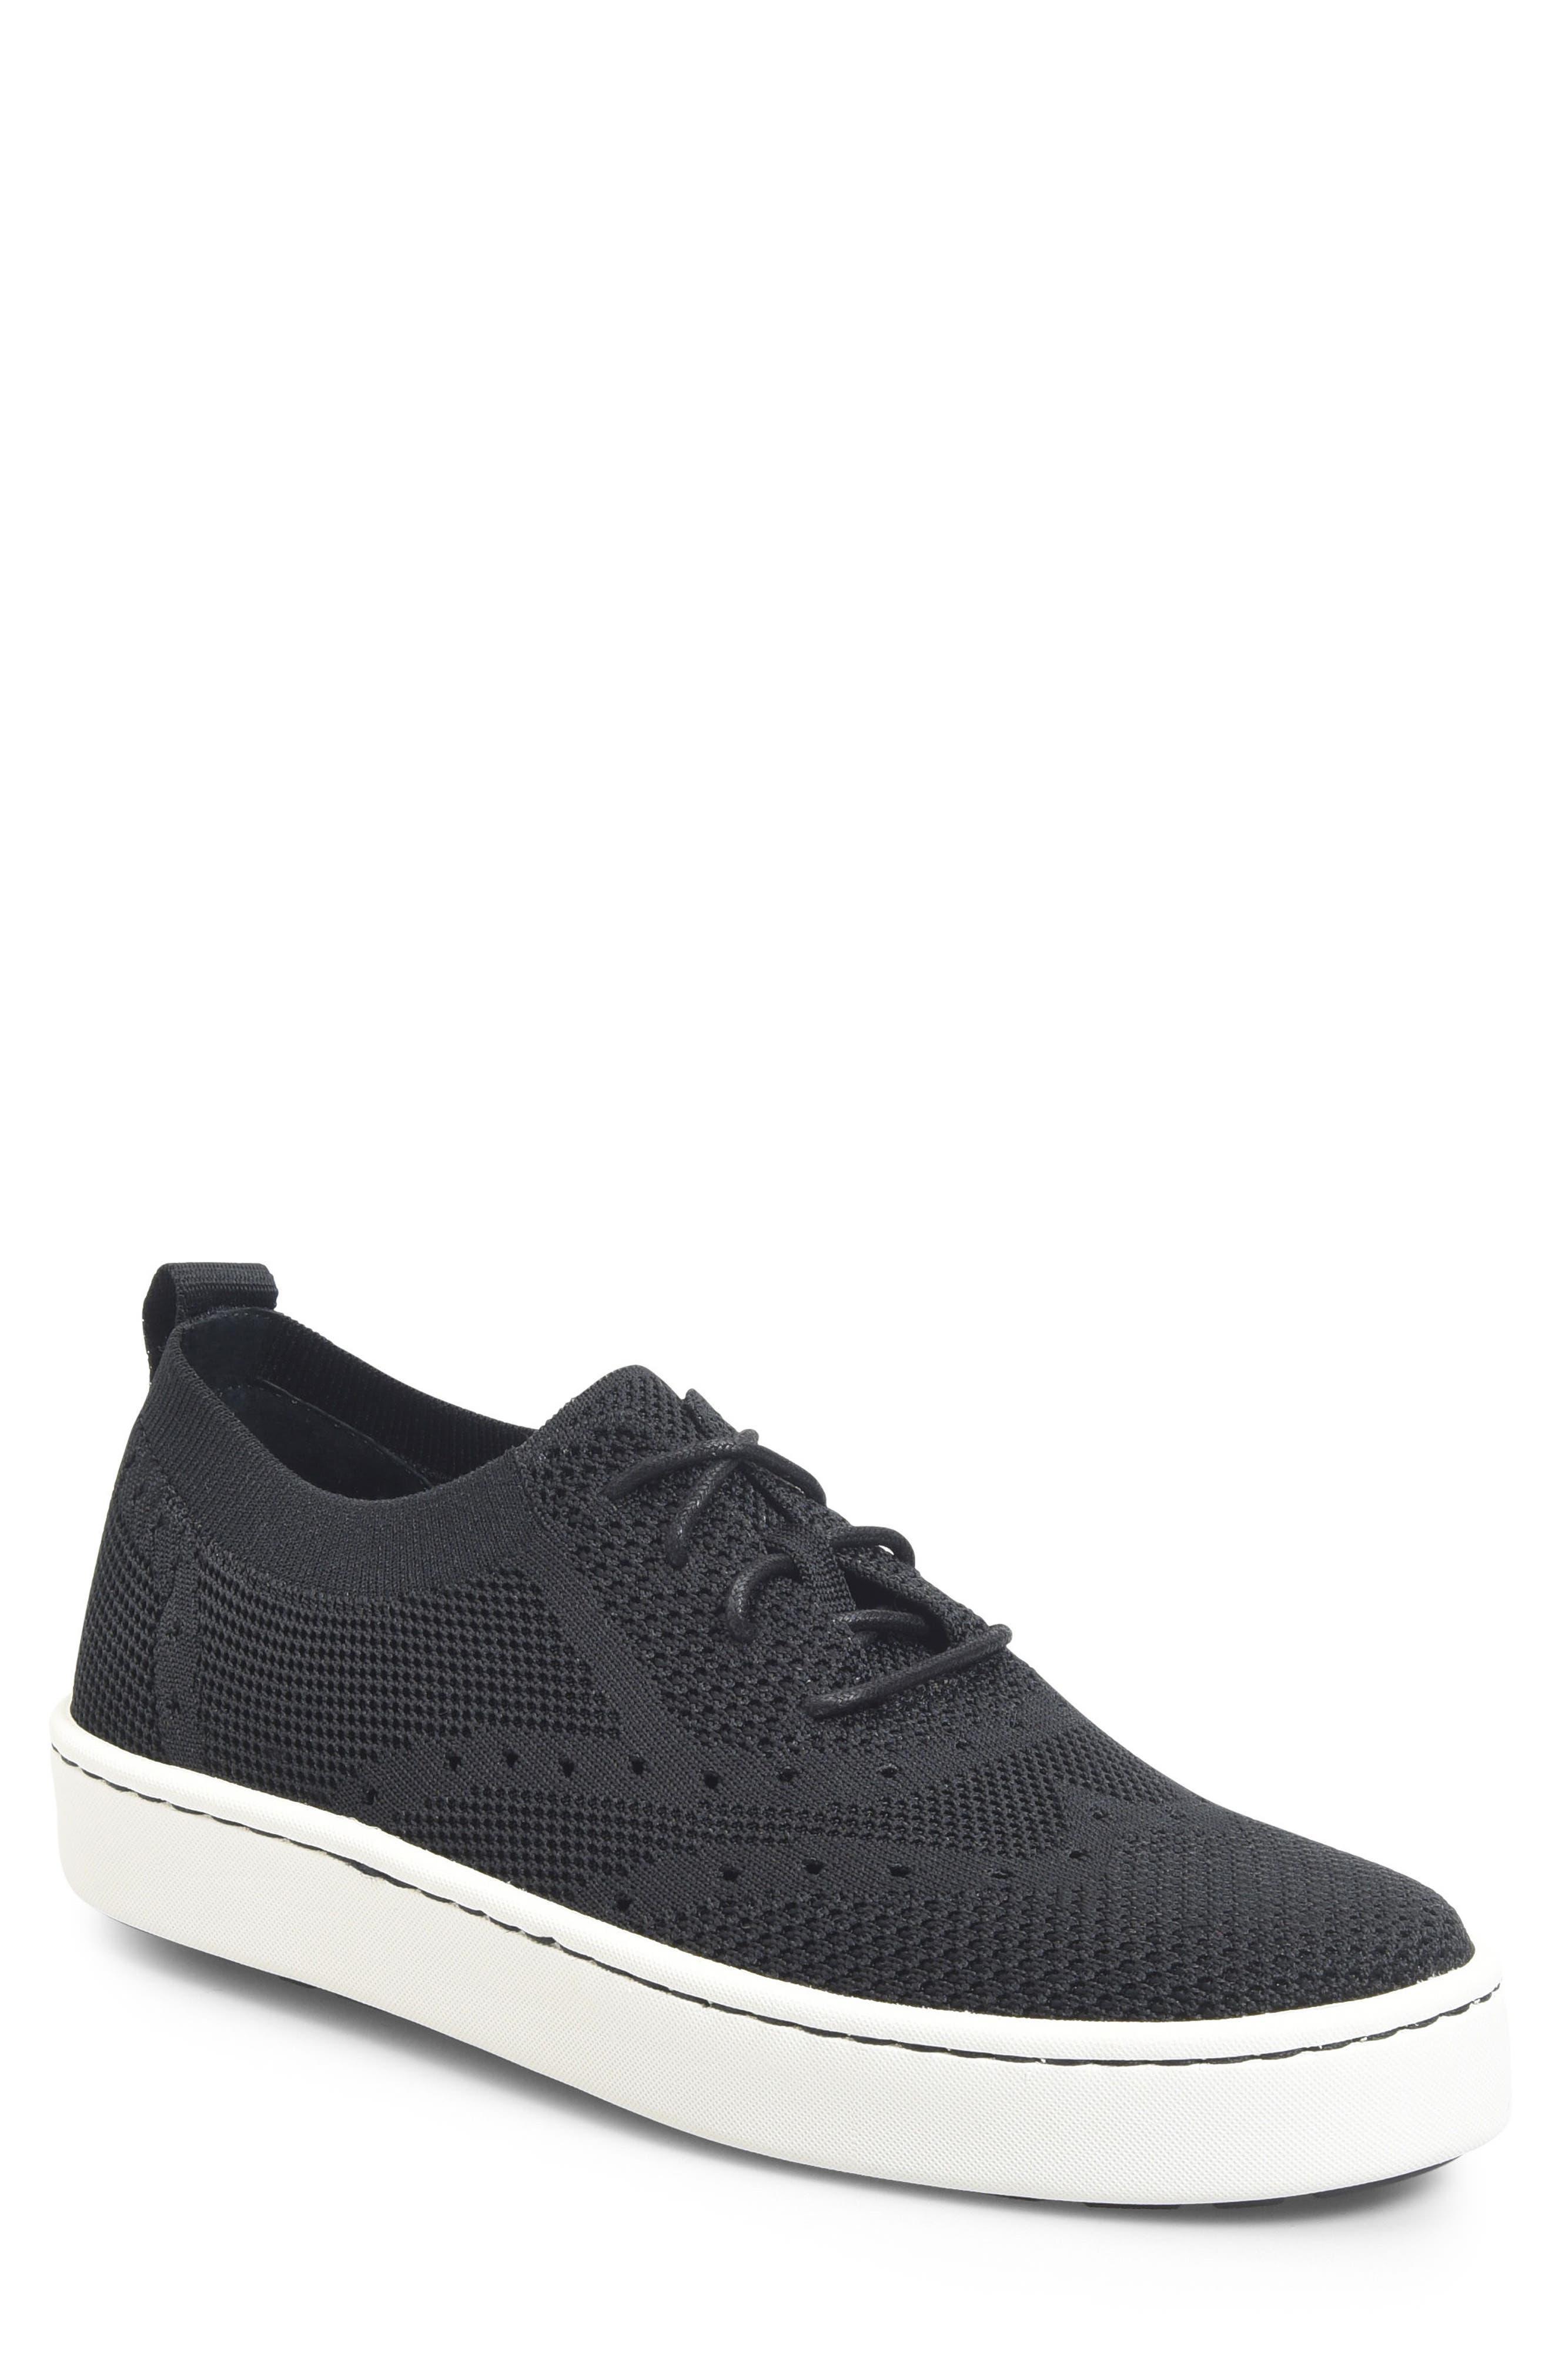 Bearse Sneaker,                             Main thumbnail 1, color,                             001